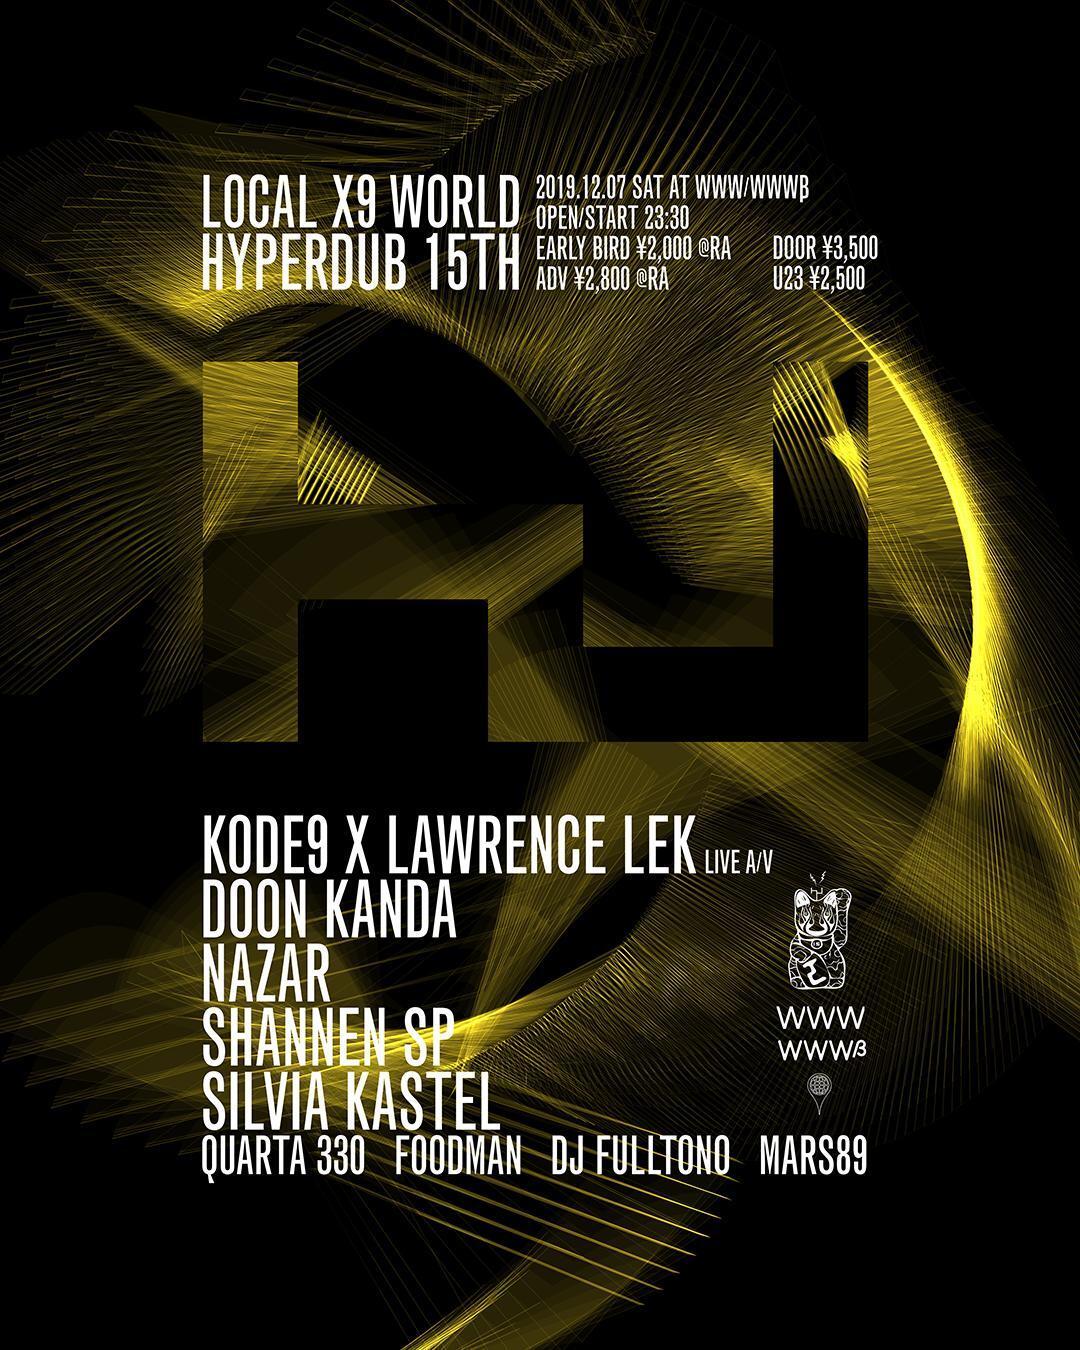 Kode9 / Lawrence Lek / Doon Kanda / Nazar / Shannen SP / Silvia Kastel / Quarta 330 / Foodman / DJ Fulltono - DJ Rashad Tribute set -  / Mars89